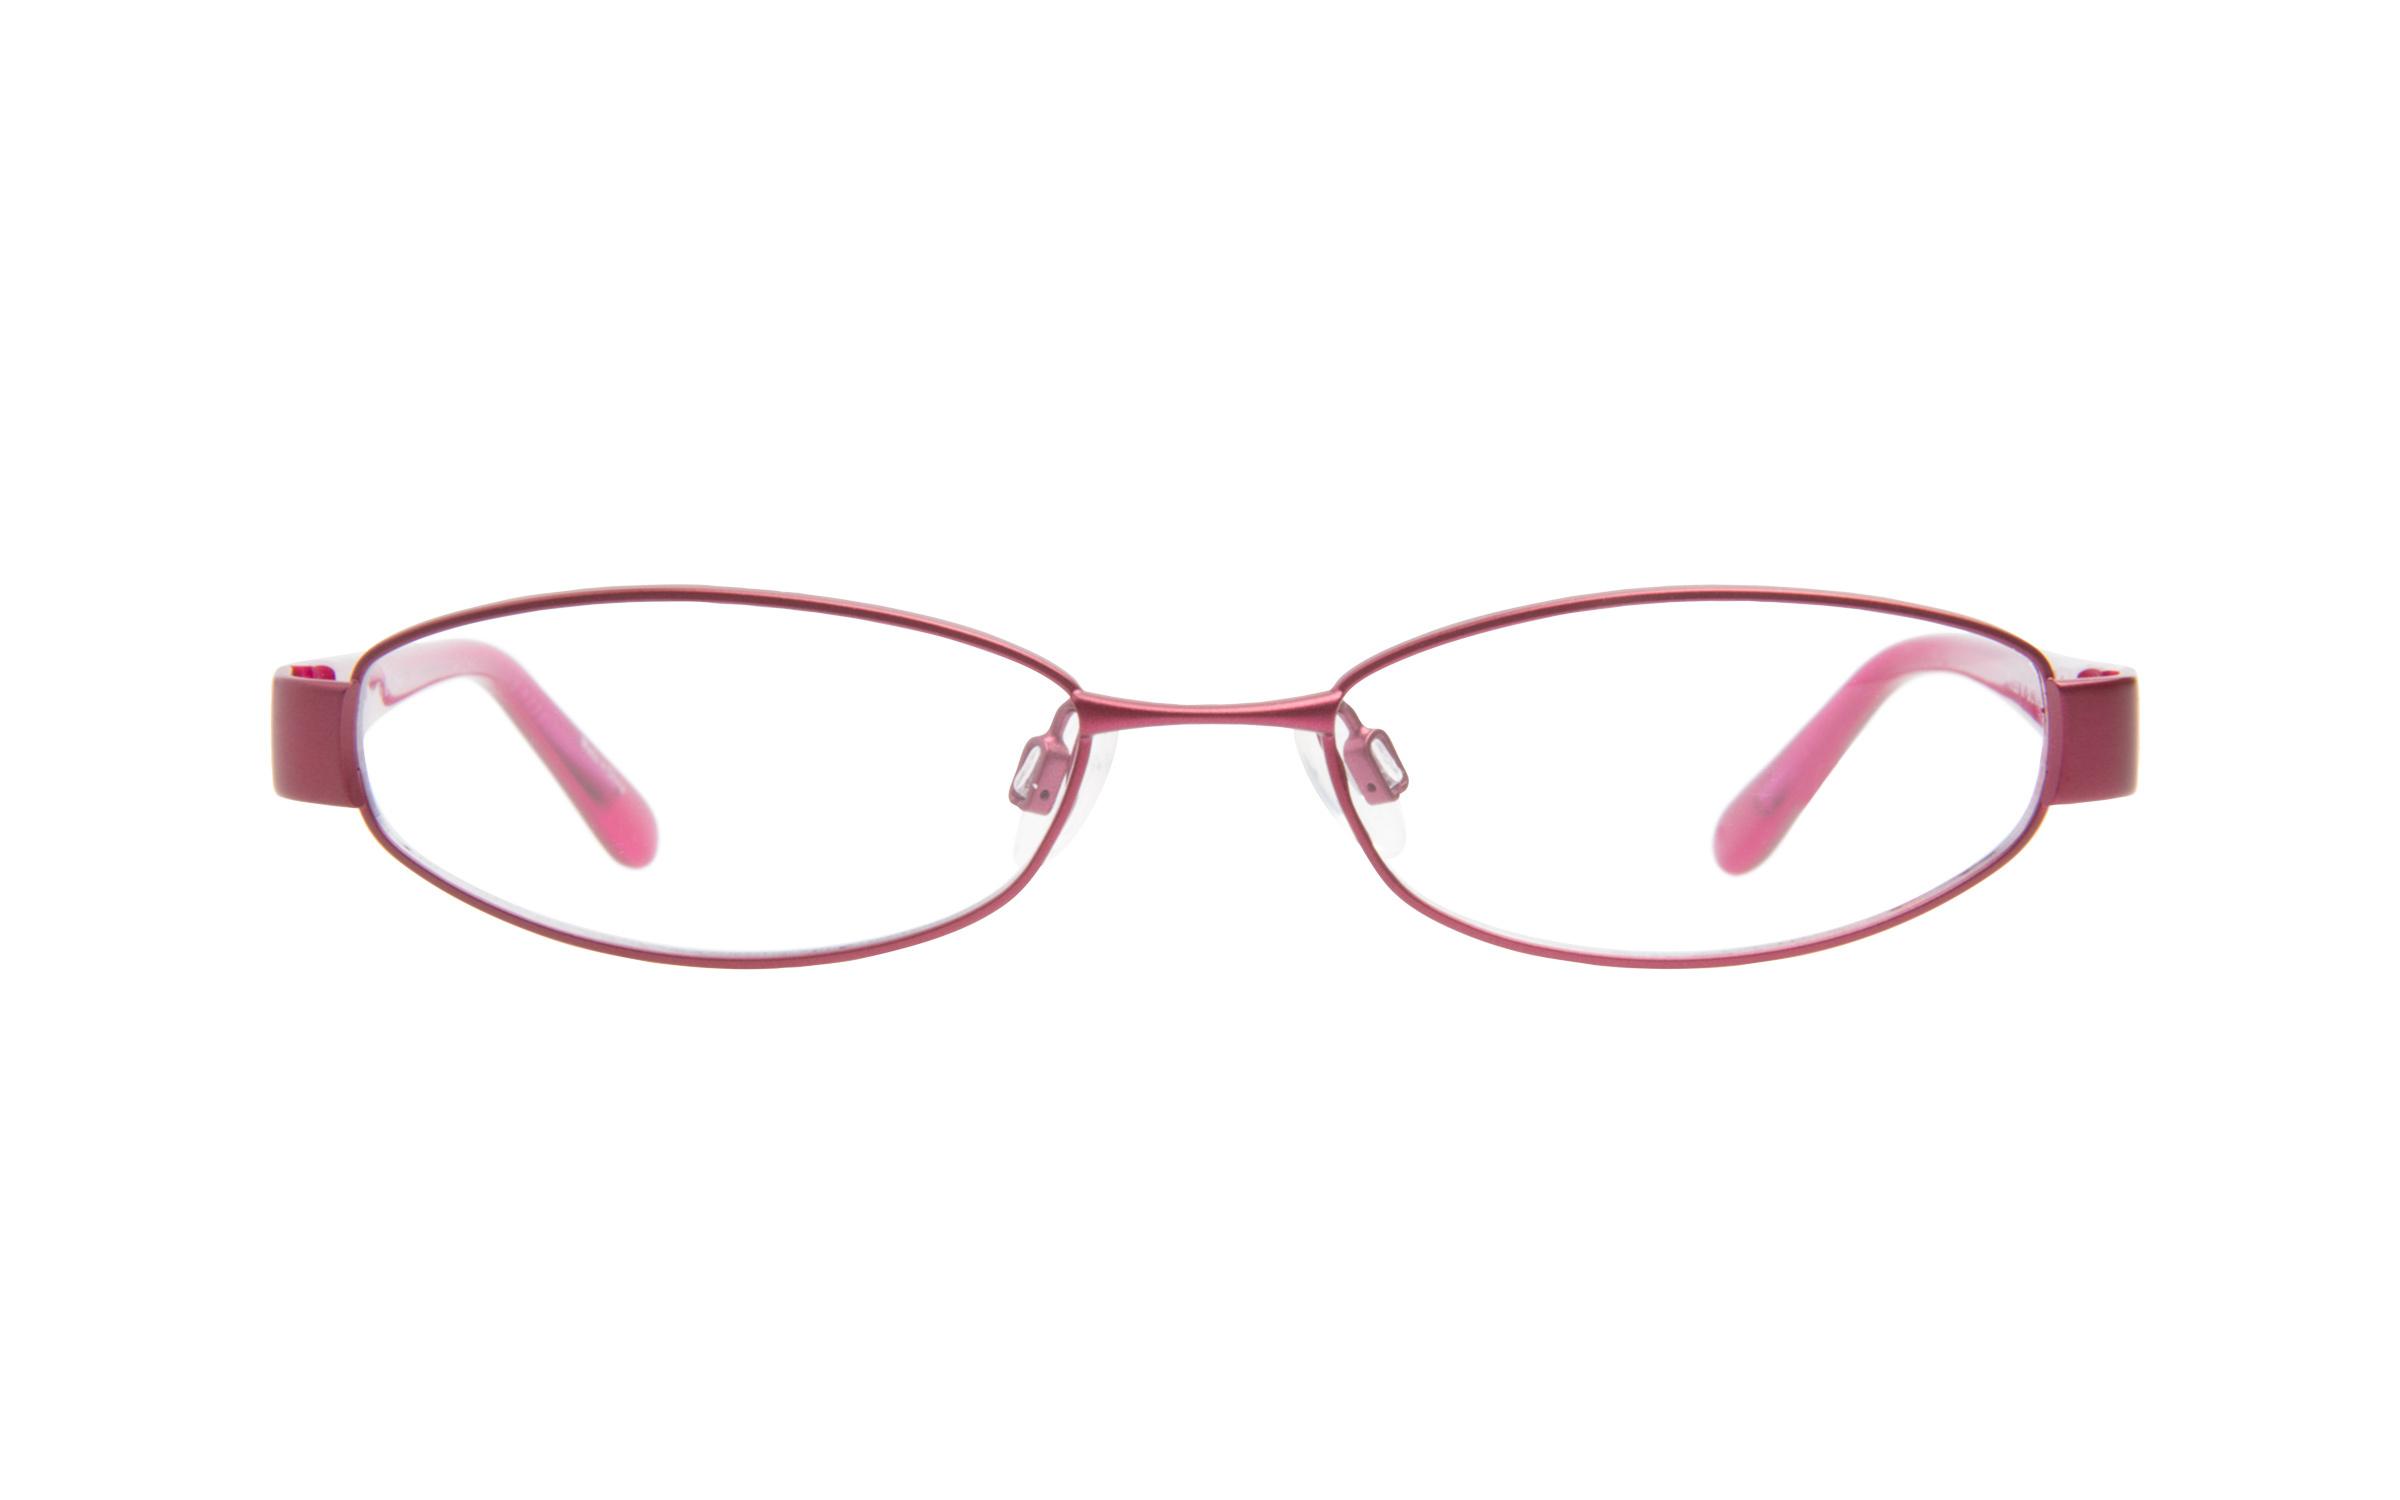 Puma PU15357 Pico Wine Glasses, Eyeglasses & Frames - for...